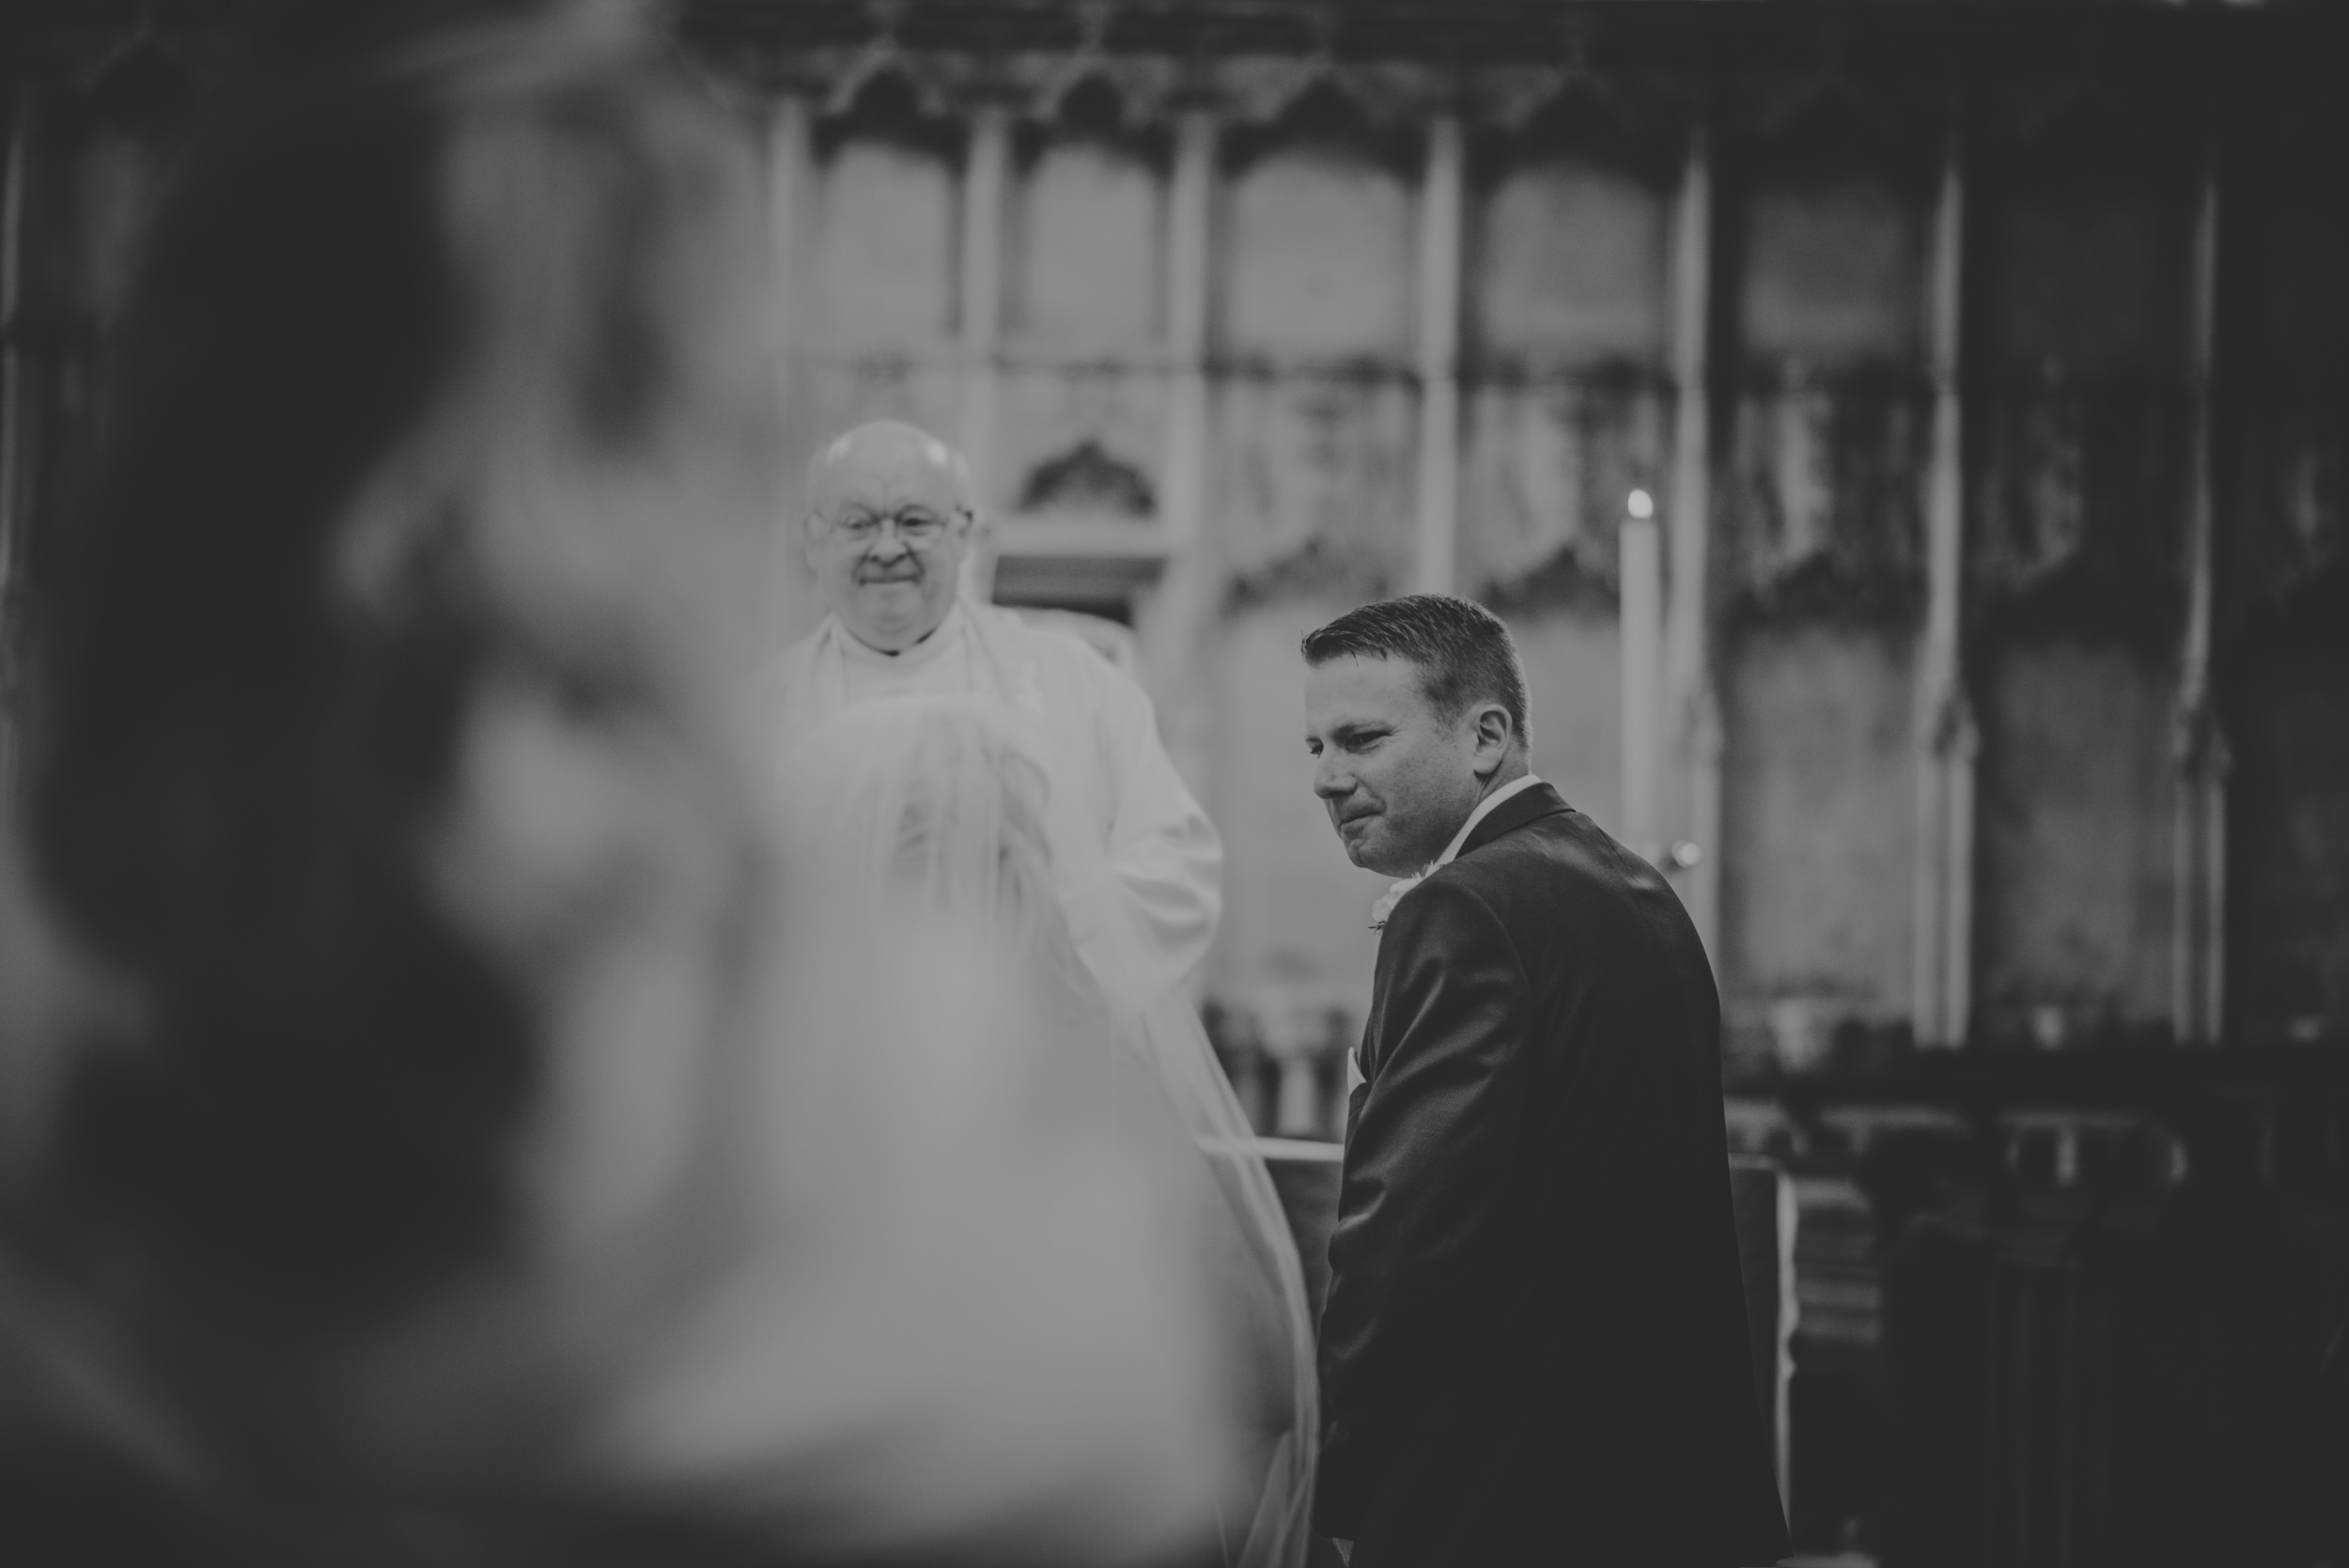 Trisha-and-Roger-wedding-The-Priory-Church-and-Chewton-Glen-Hotel-Christchurch-Manu-Mendoza-Wedding-Photography-116.jpg